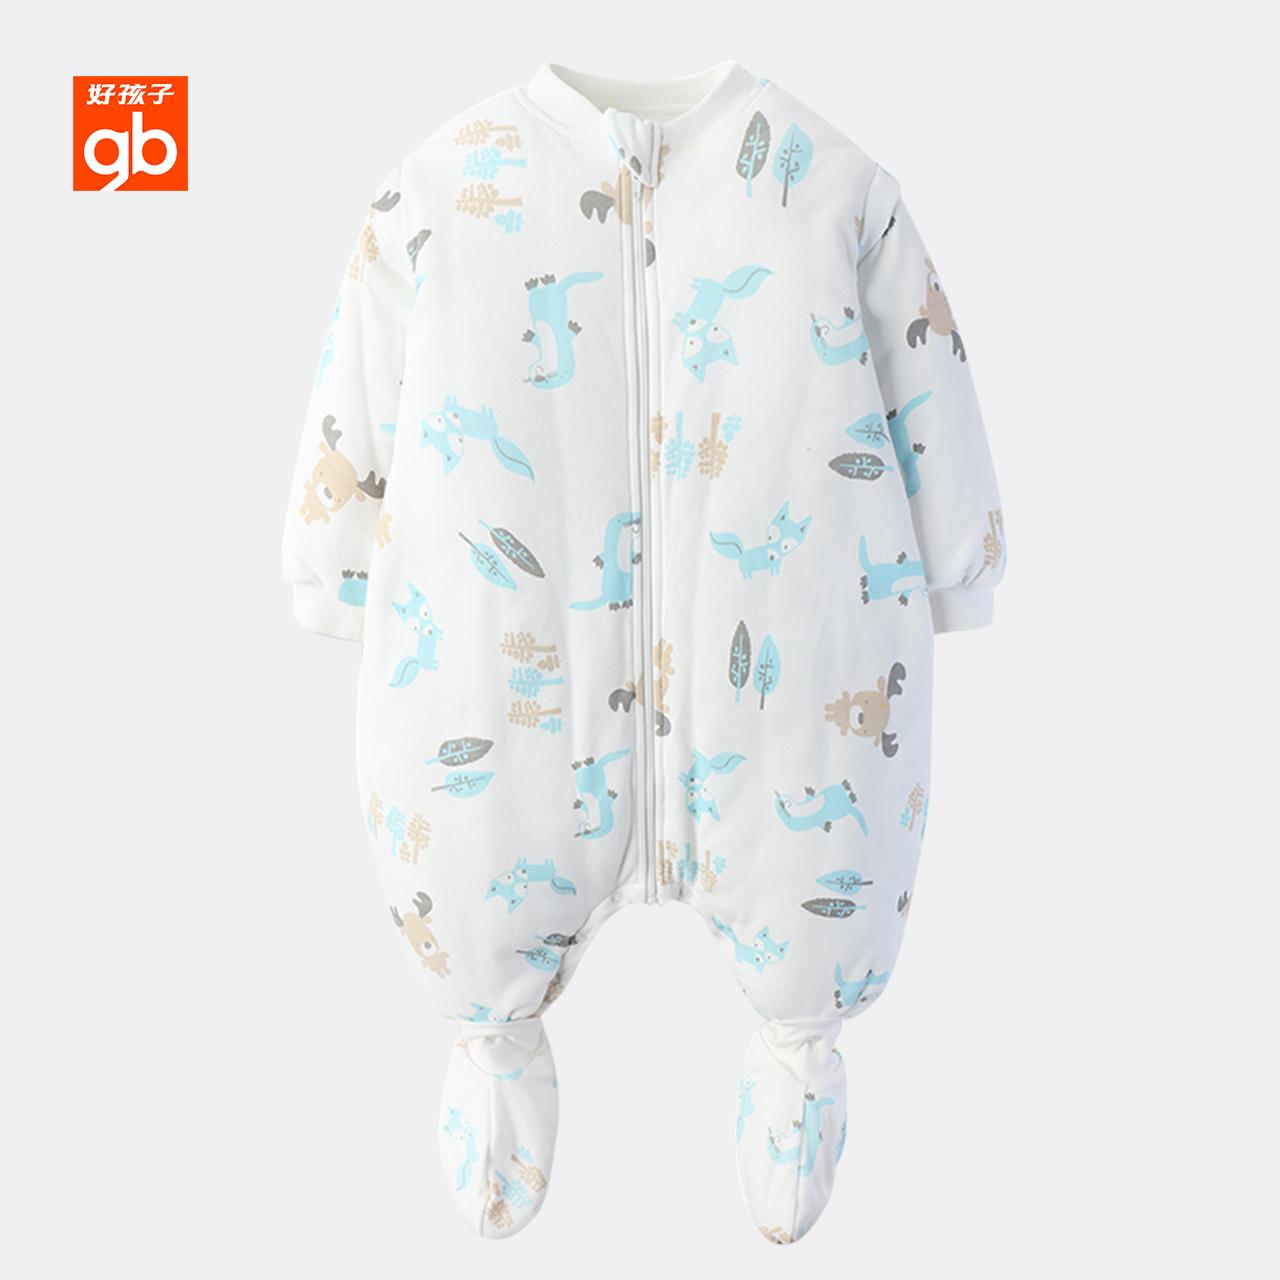 gb好孩子婴儿睡袋宝宝夹棉睡袋连脚套分腿式春秋季薄棉睡袋防踢被